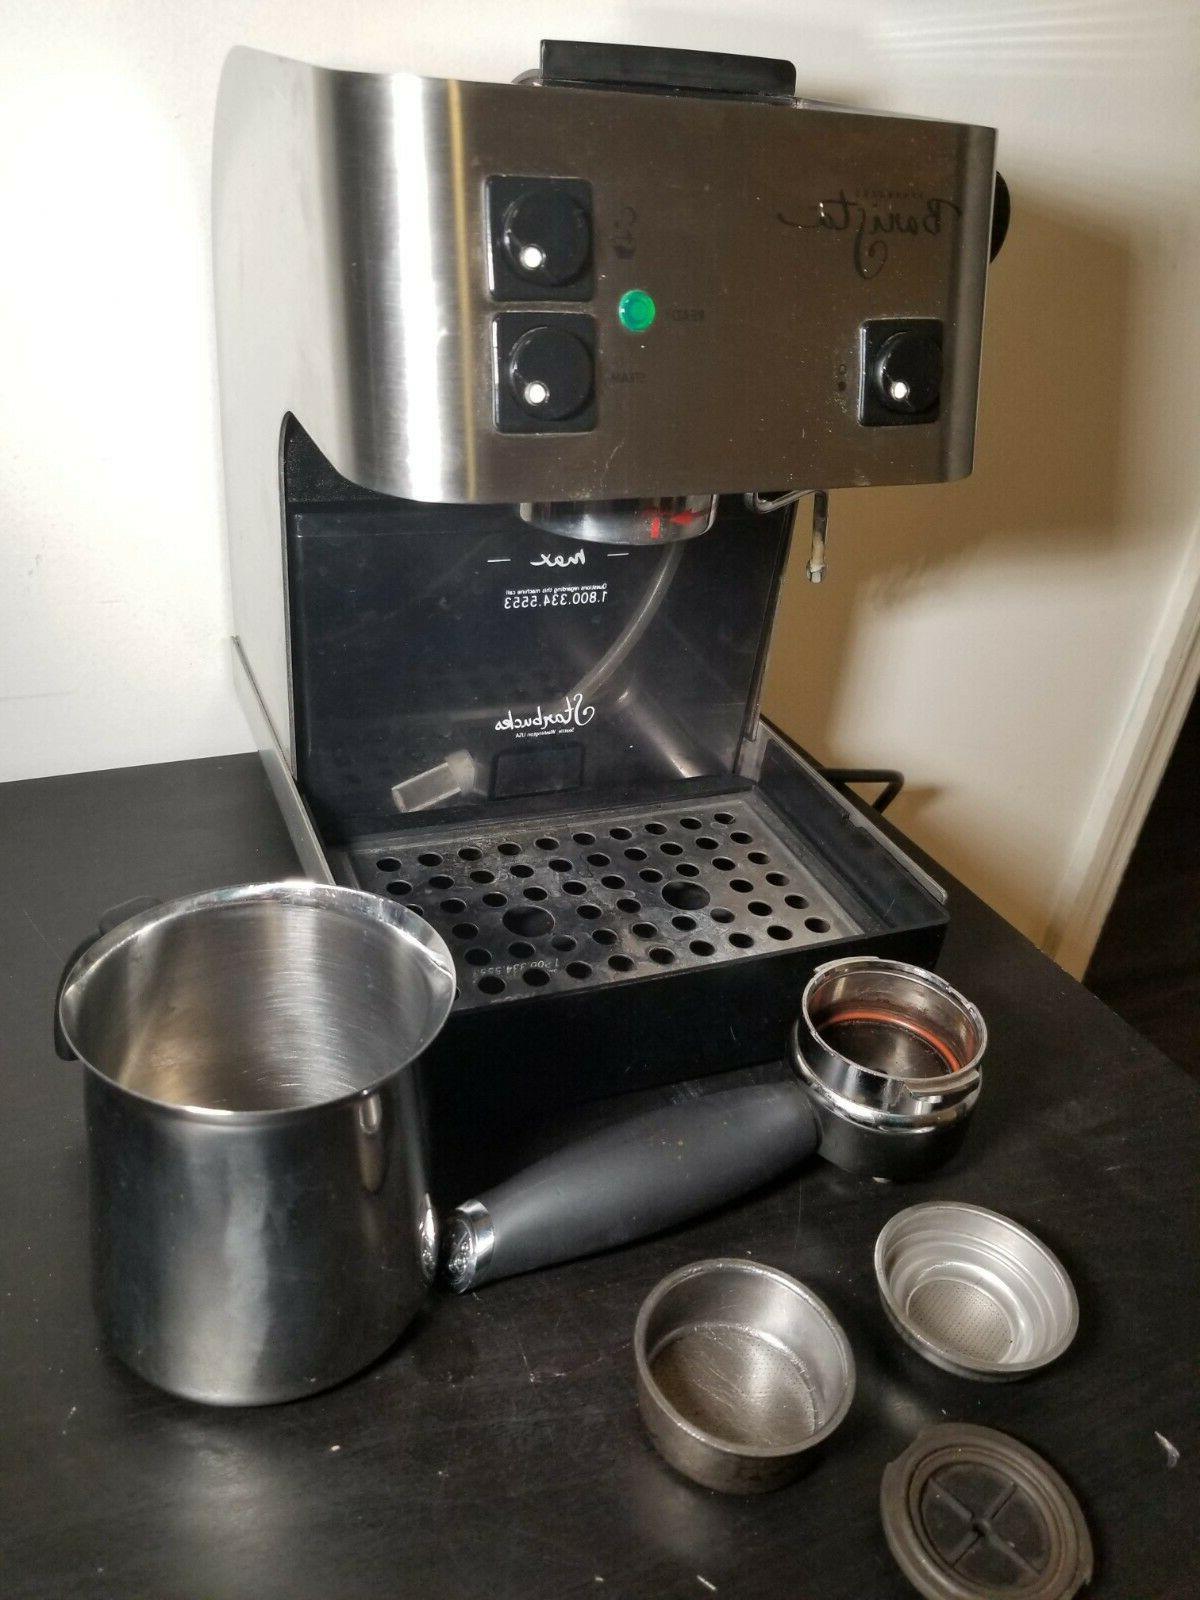 barista saeco espresso coffee machine stainless steel